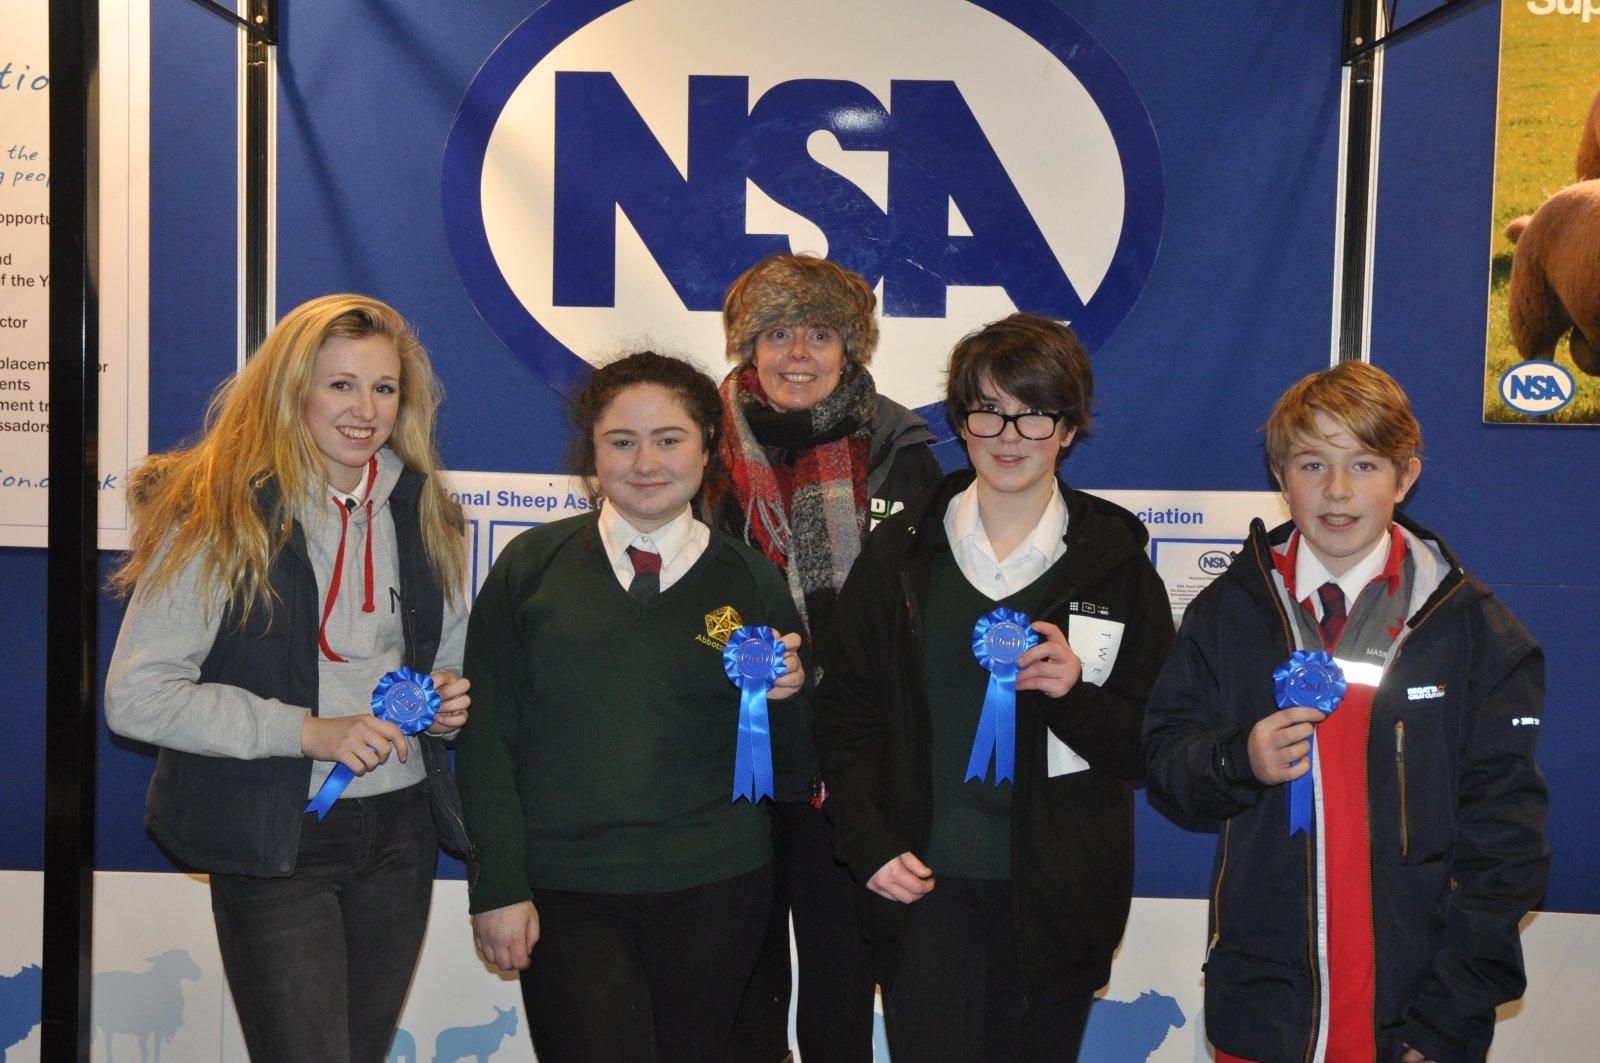 2nd inter-schools NSA Next Generation Shepherd Competition, Abbotsholme School